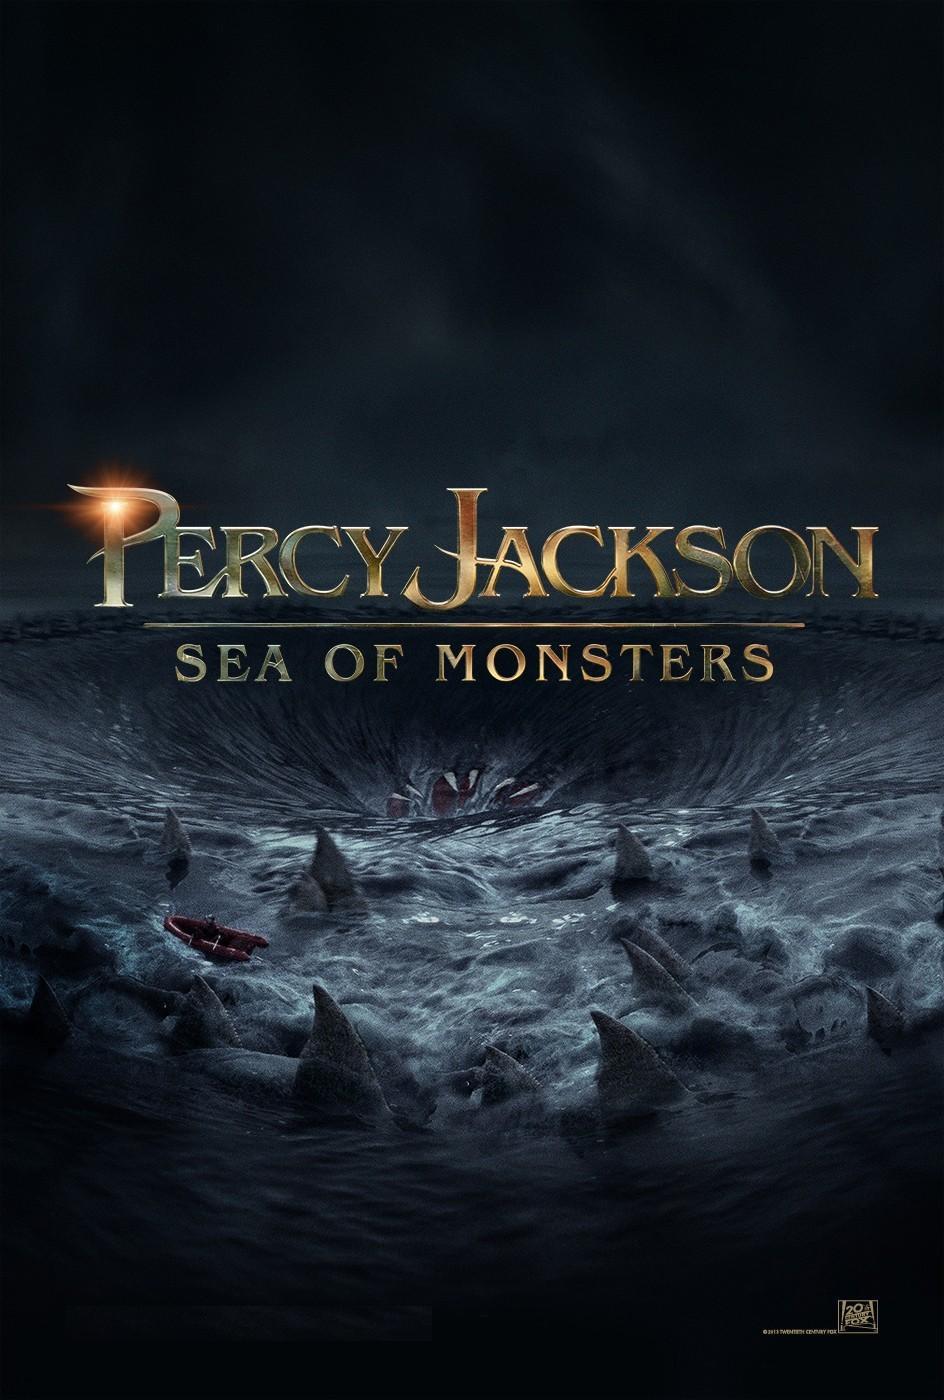 Percy Jackson Sea Of Monsters 2013 Photo Gallery Imdb